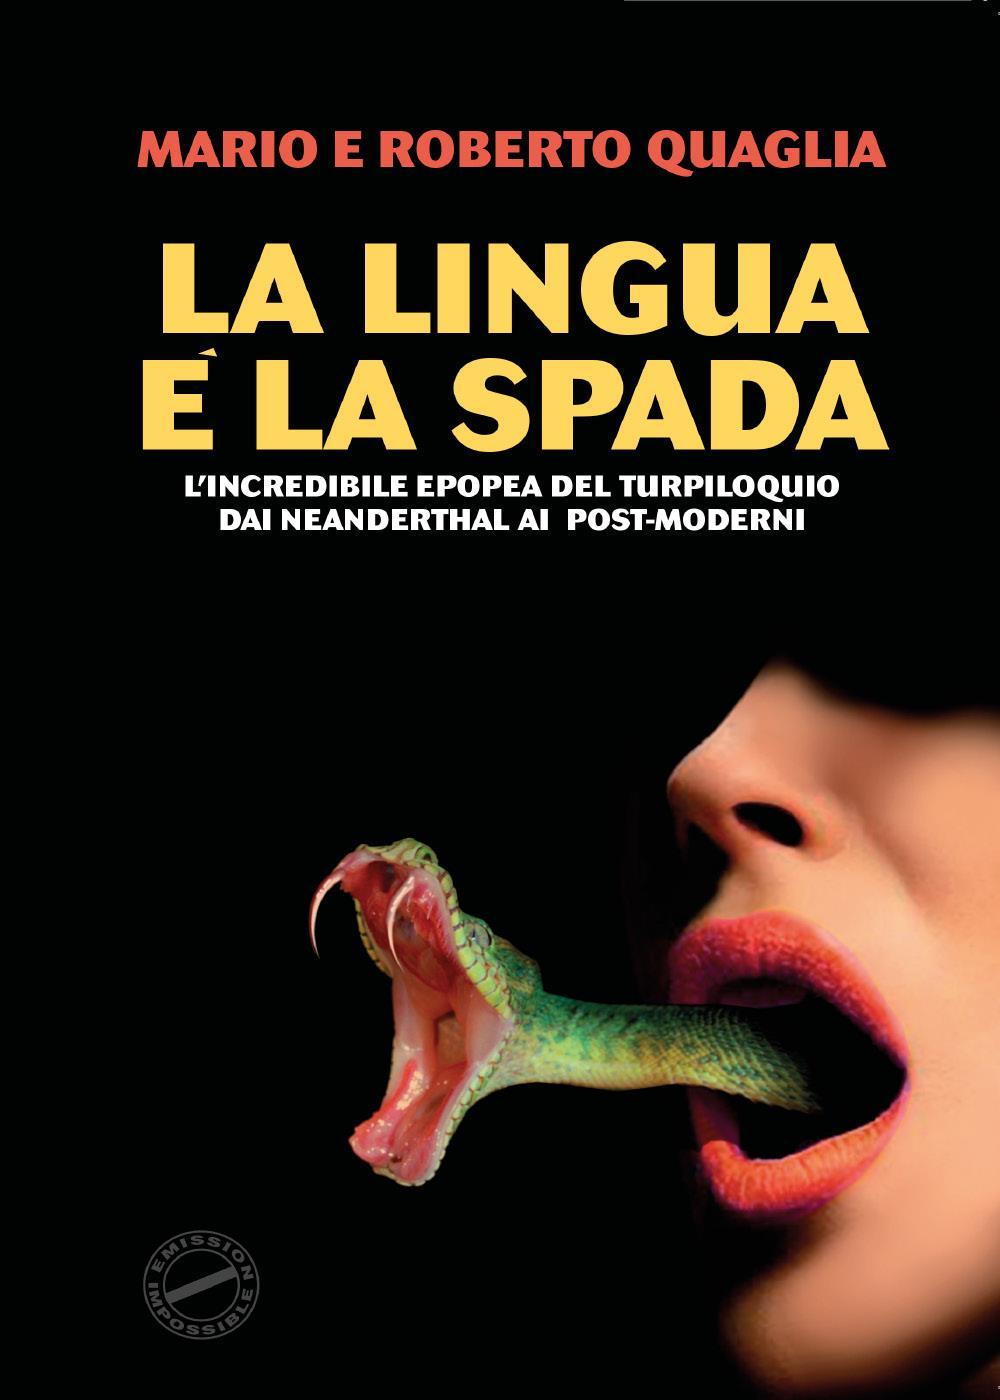 La Lingua è la Spada